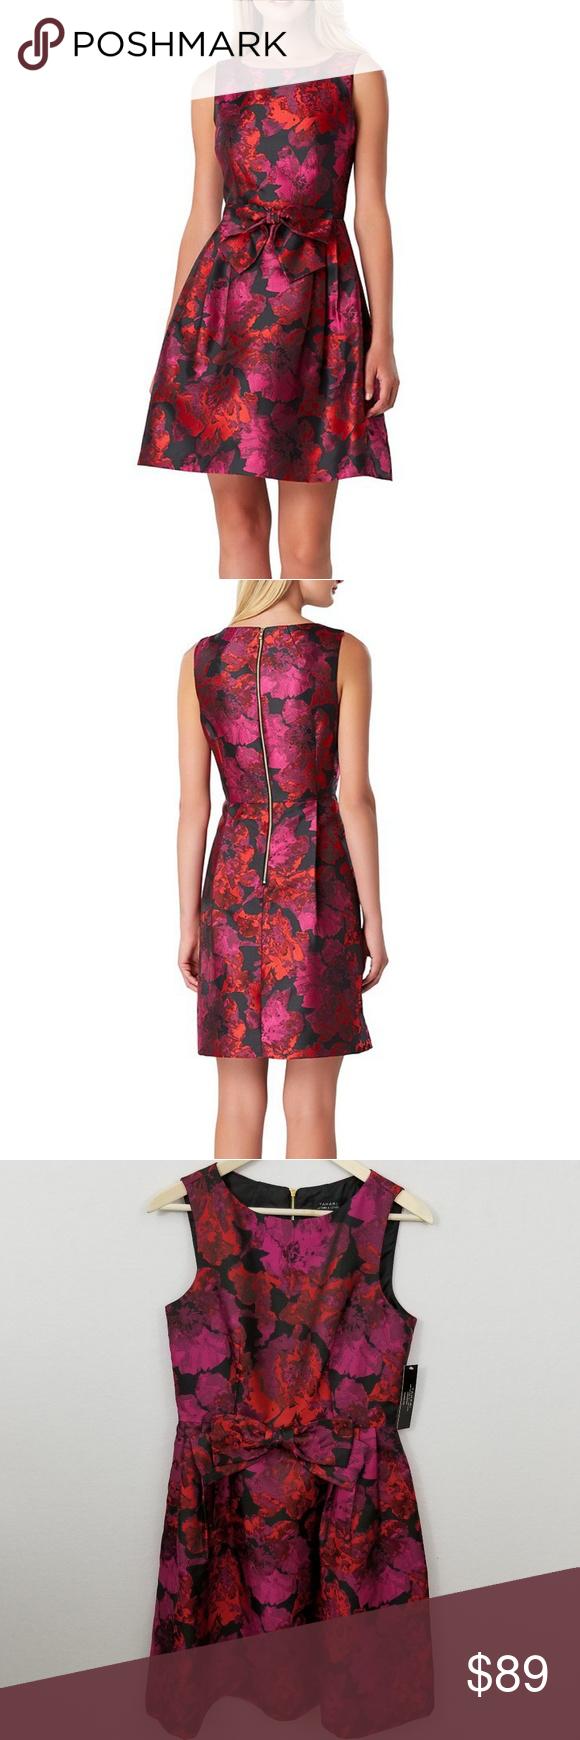 Tahari Floral Jacquard Bow Cocktail Dress Clothes Design Dresses Fashion [ 1740 x 580 Pixel ]